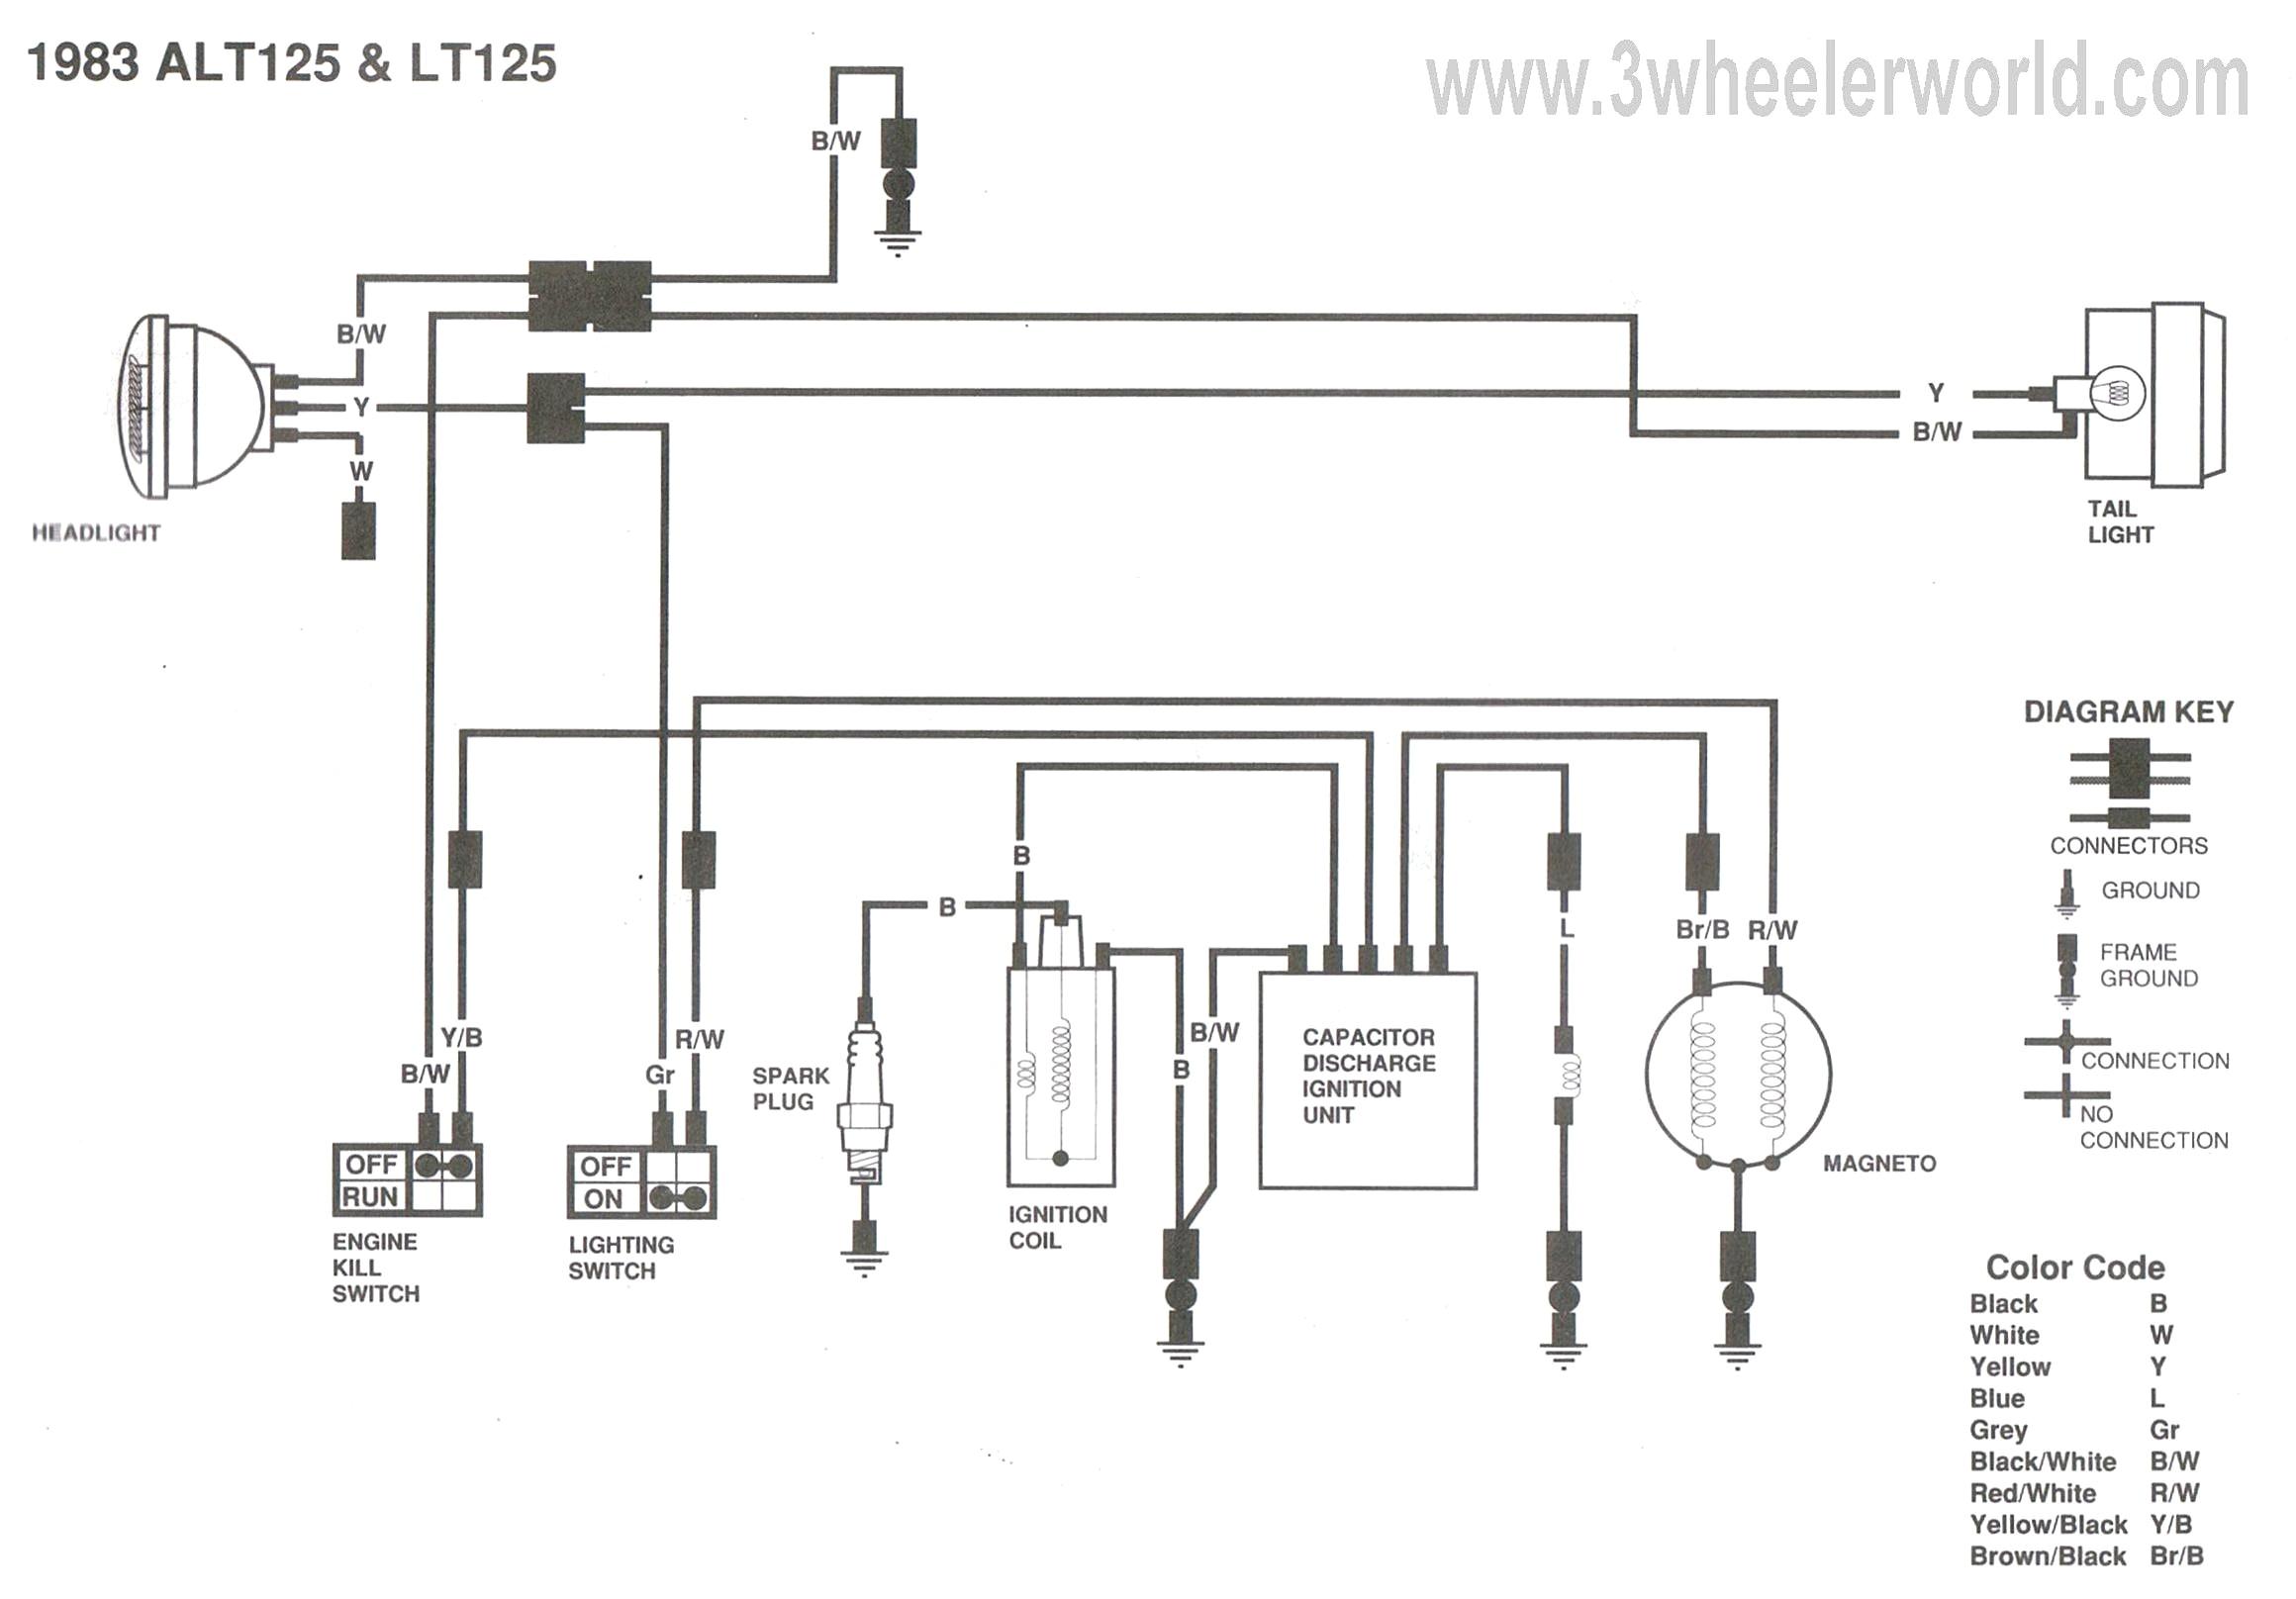 starter wiring schematic for kawasaki mule 610 wiring diagram insidewrg 1615 mule wiring diagram starter